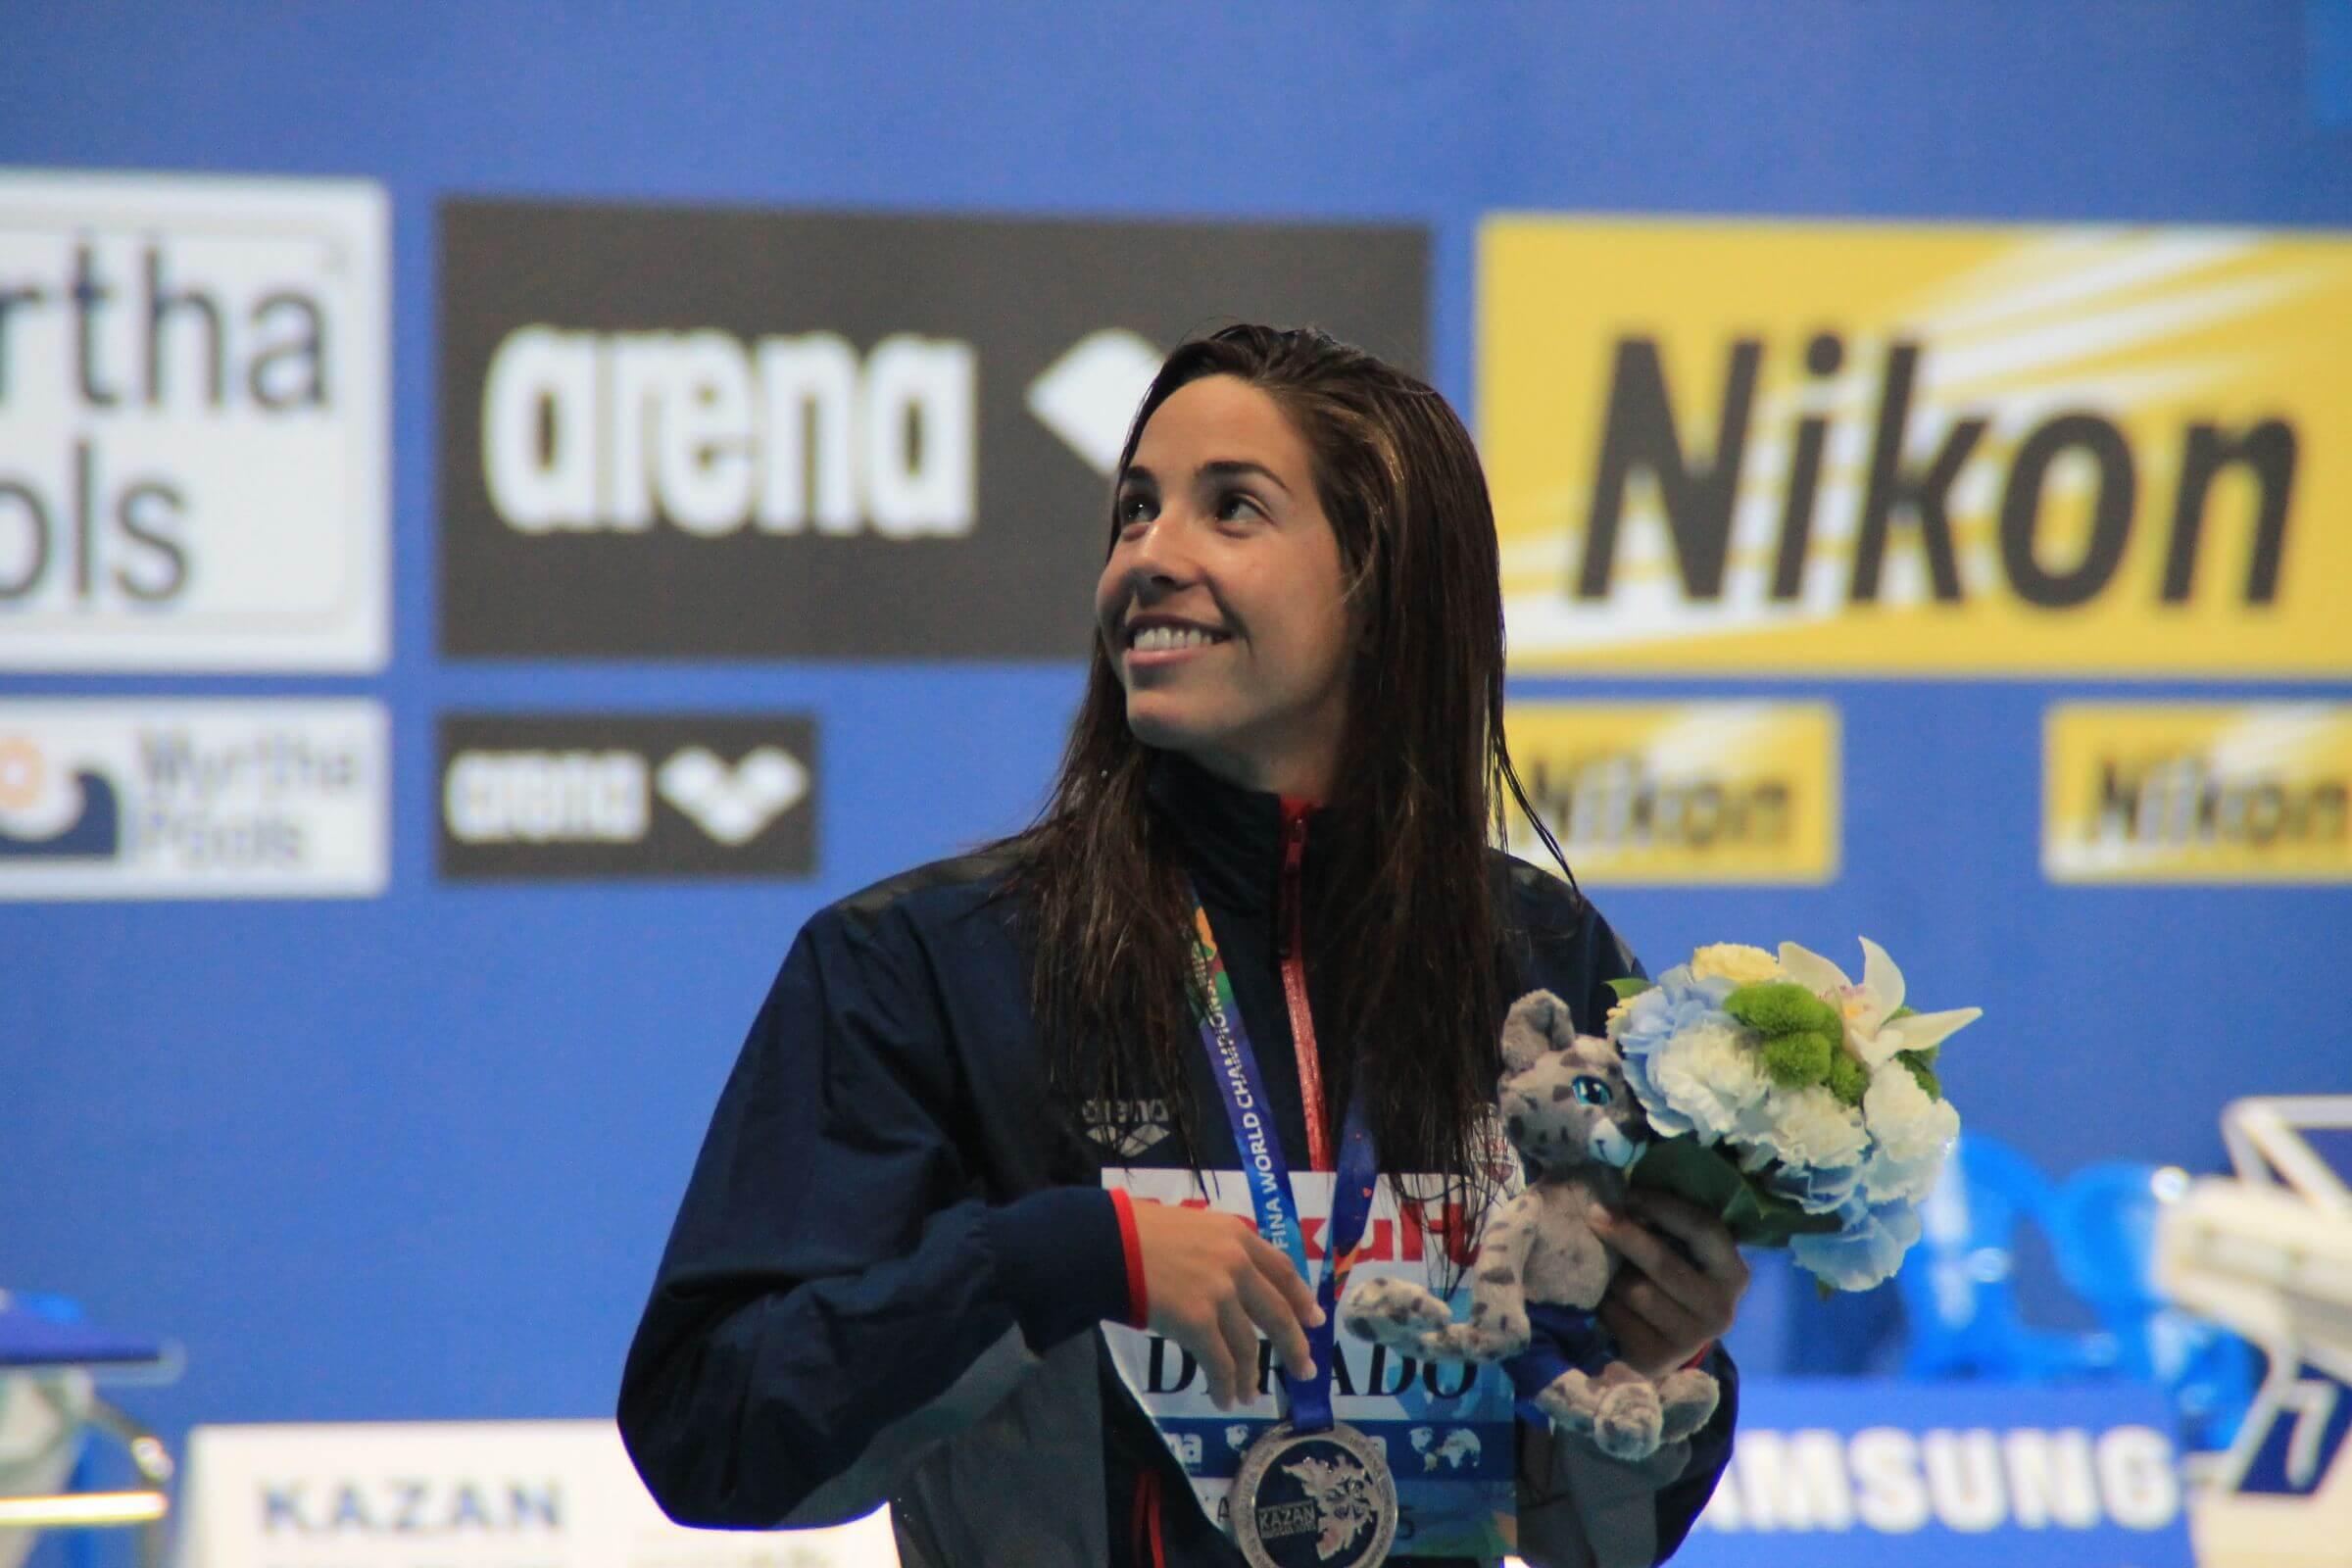 maya-dirado-world-championships-2015 (2)